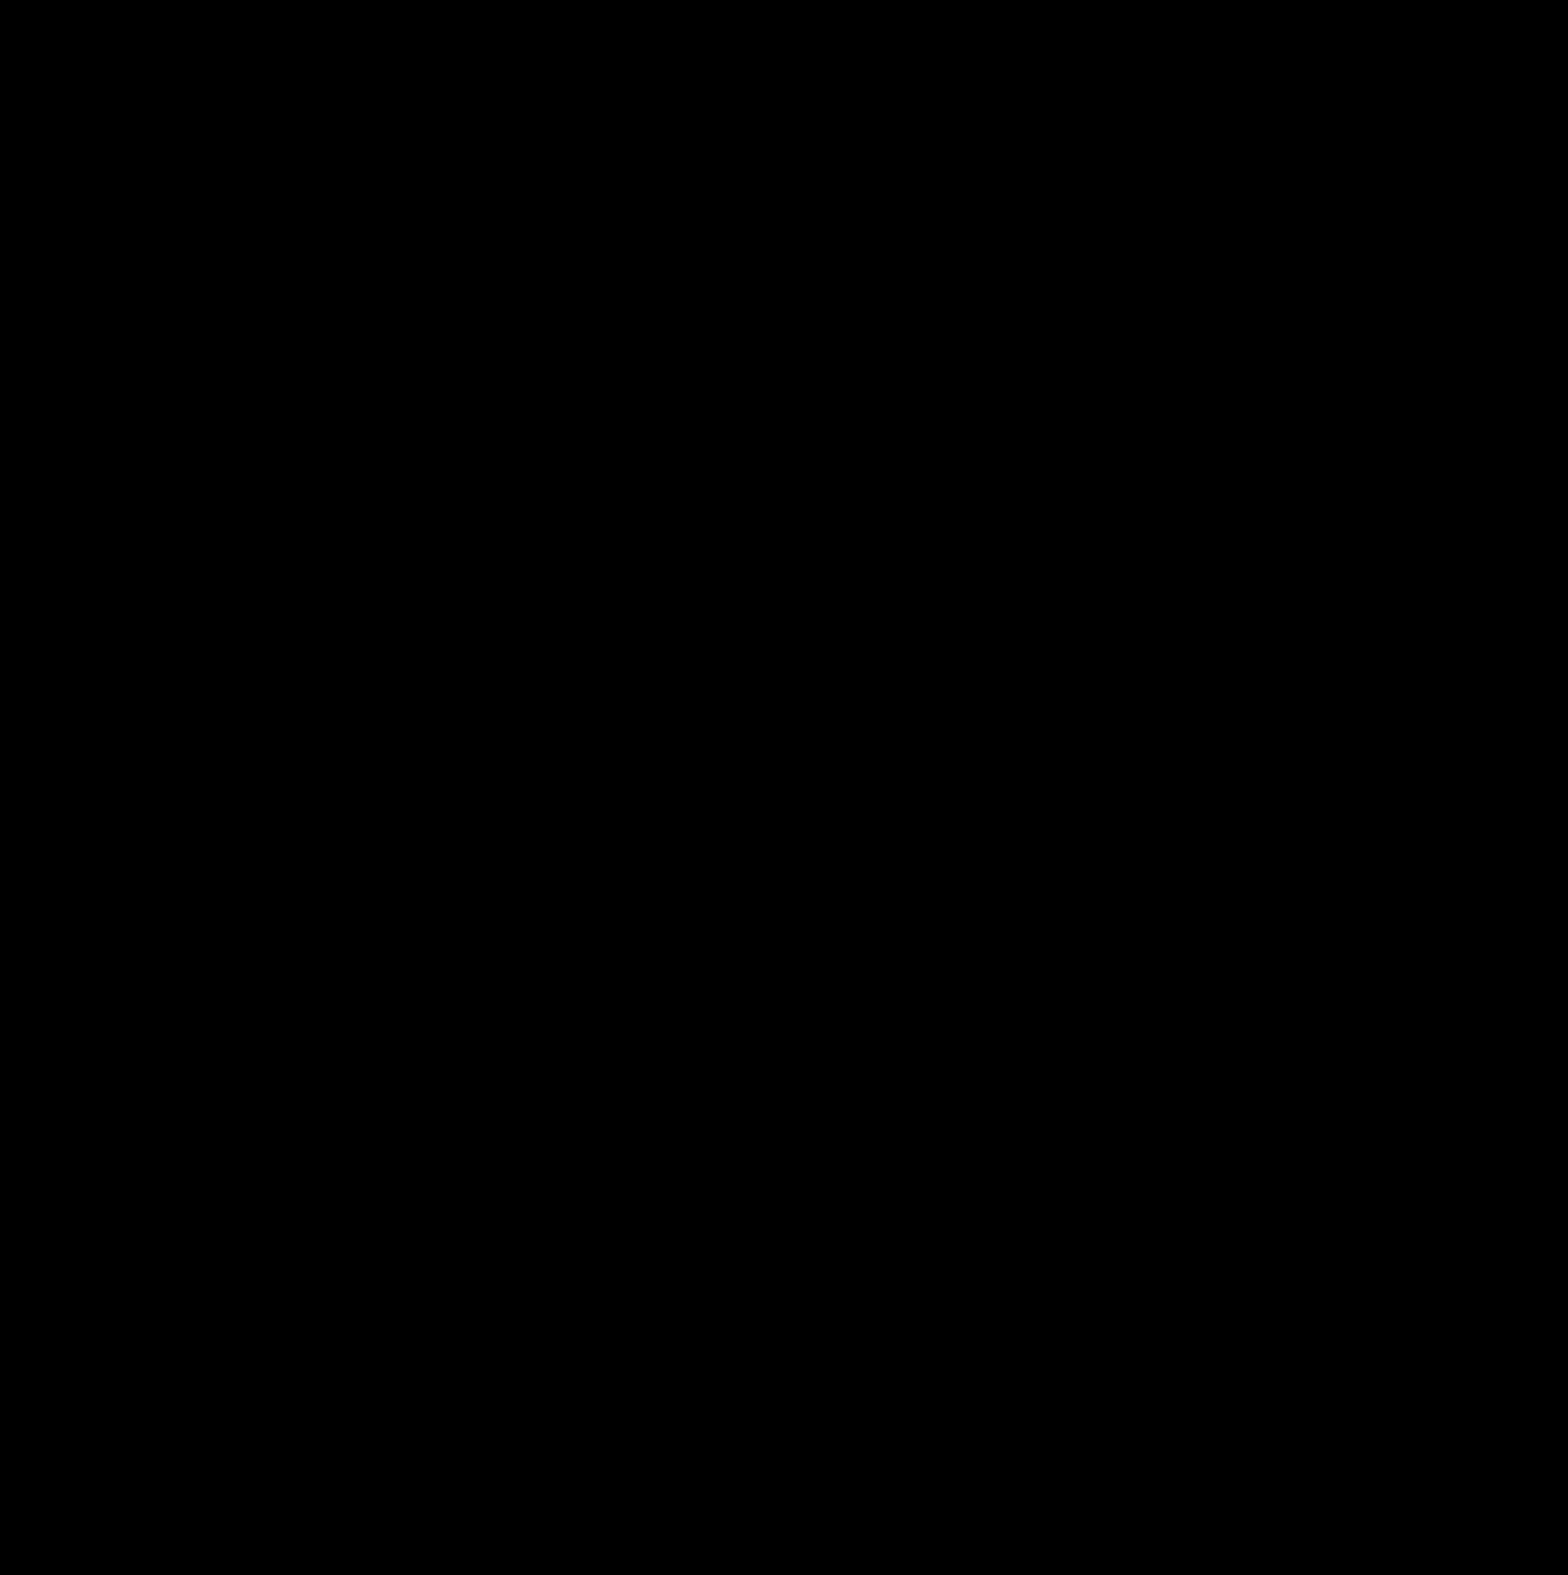 o10tic logo